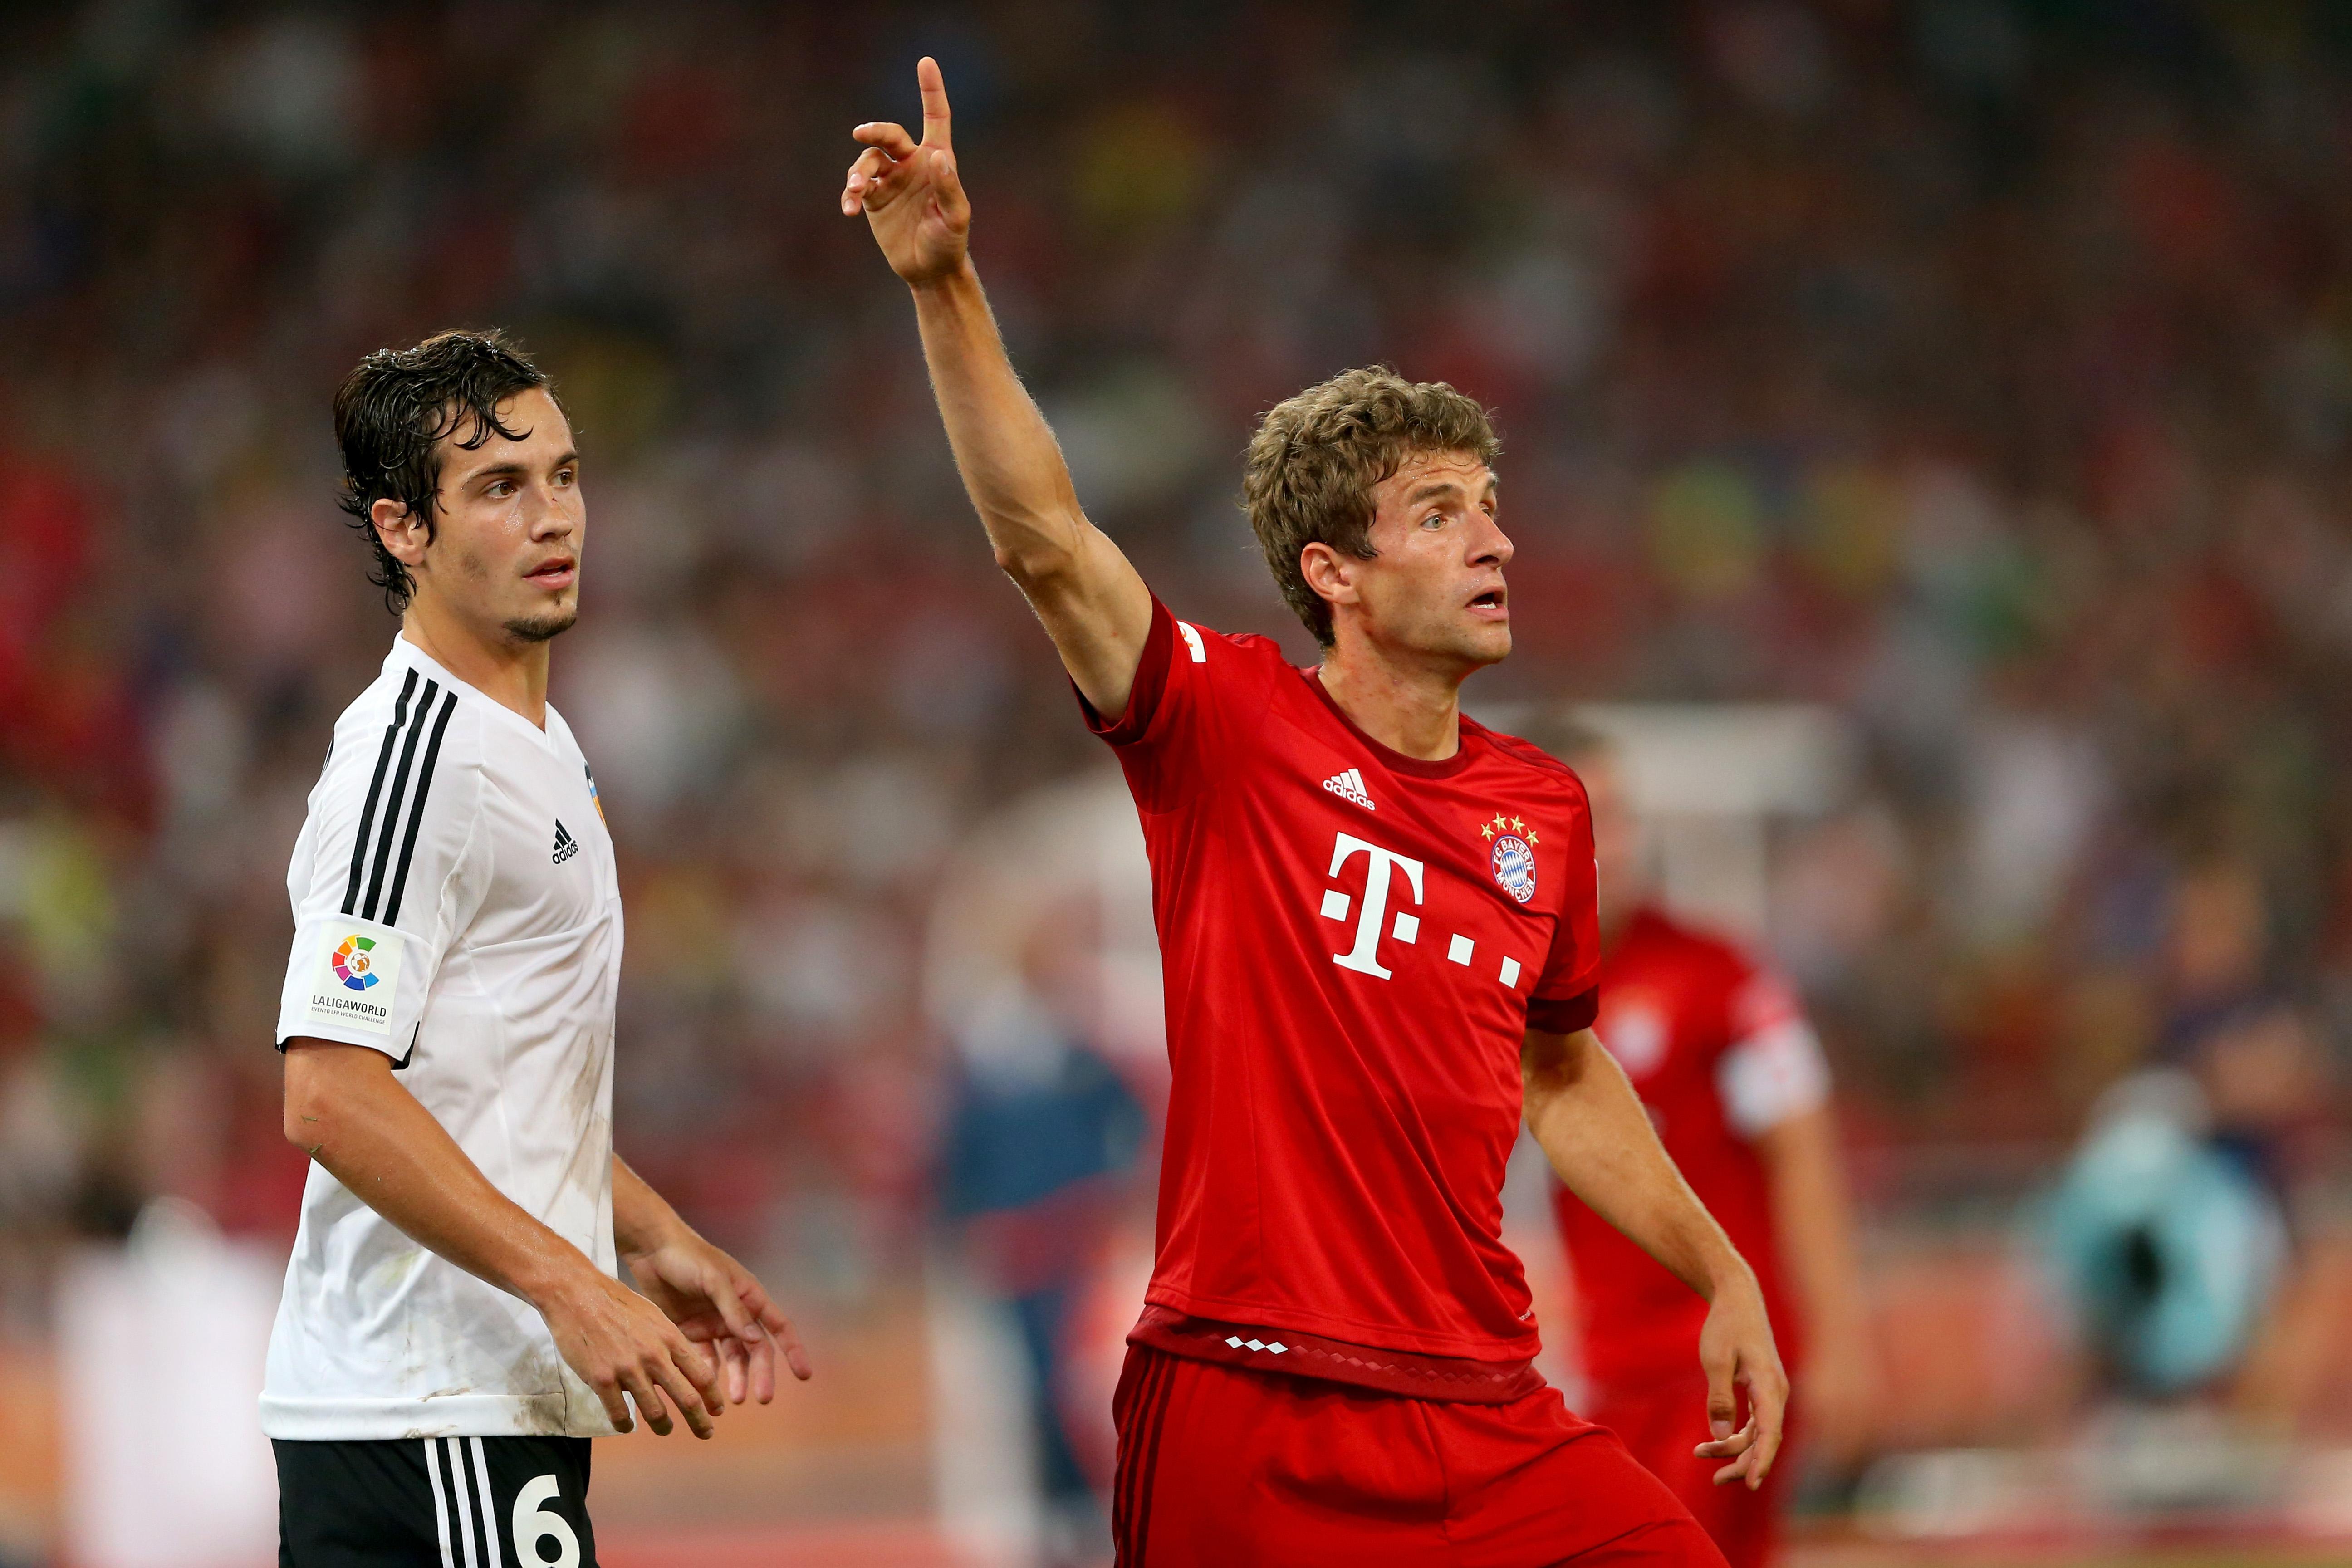 8c6f11302a Müller desbanca Nordtveit e leva o gol mais bonito do futebol internacional